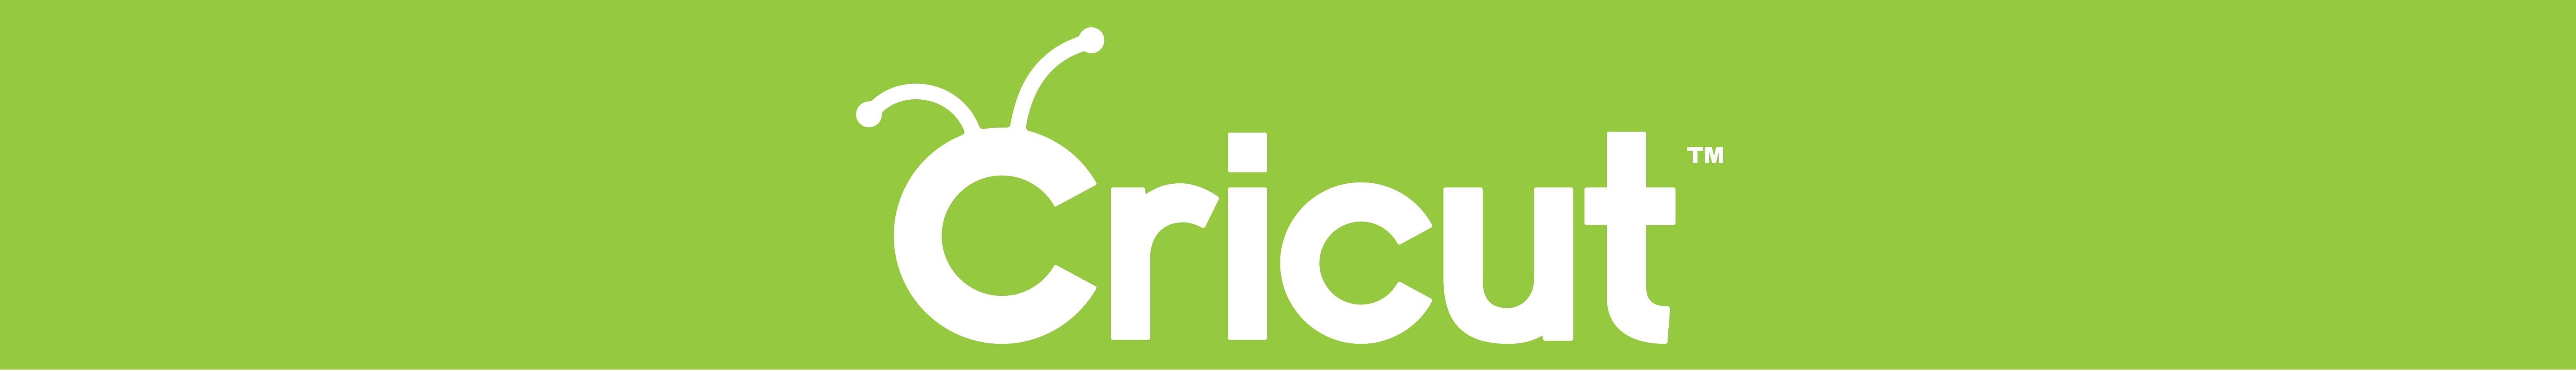 Cricut header